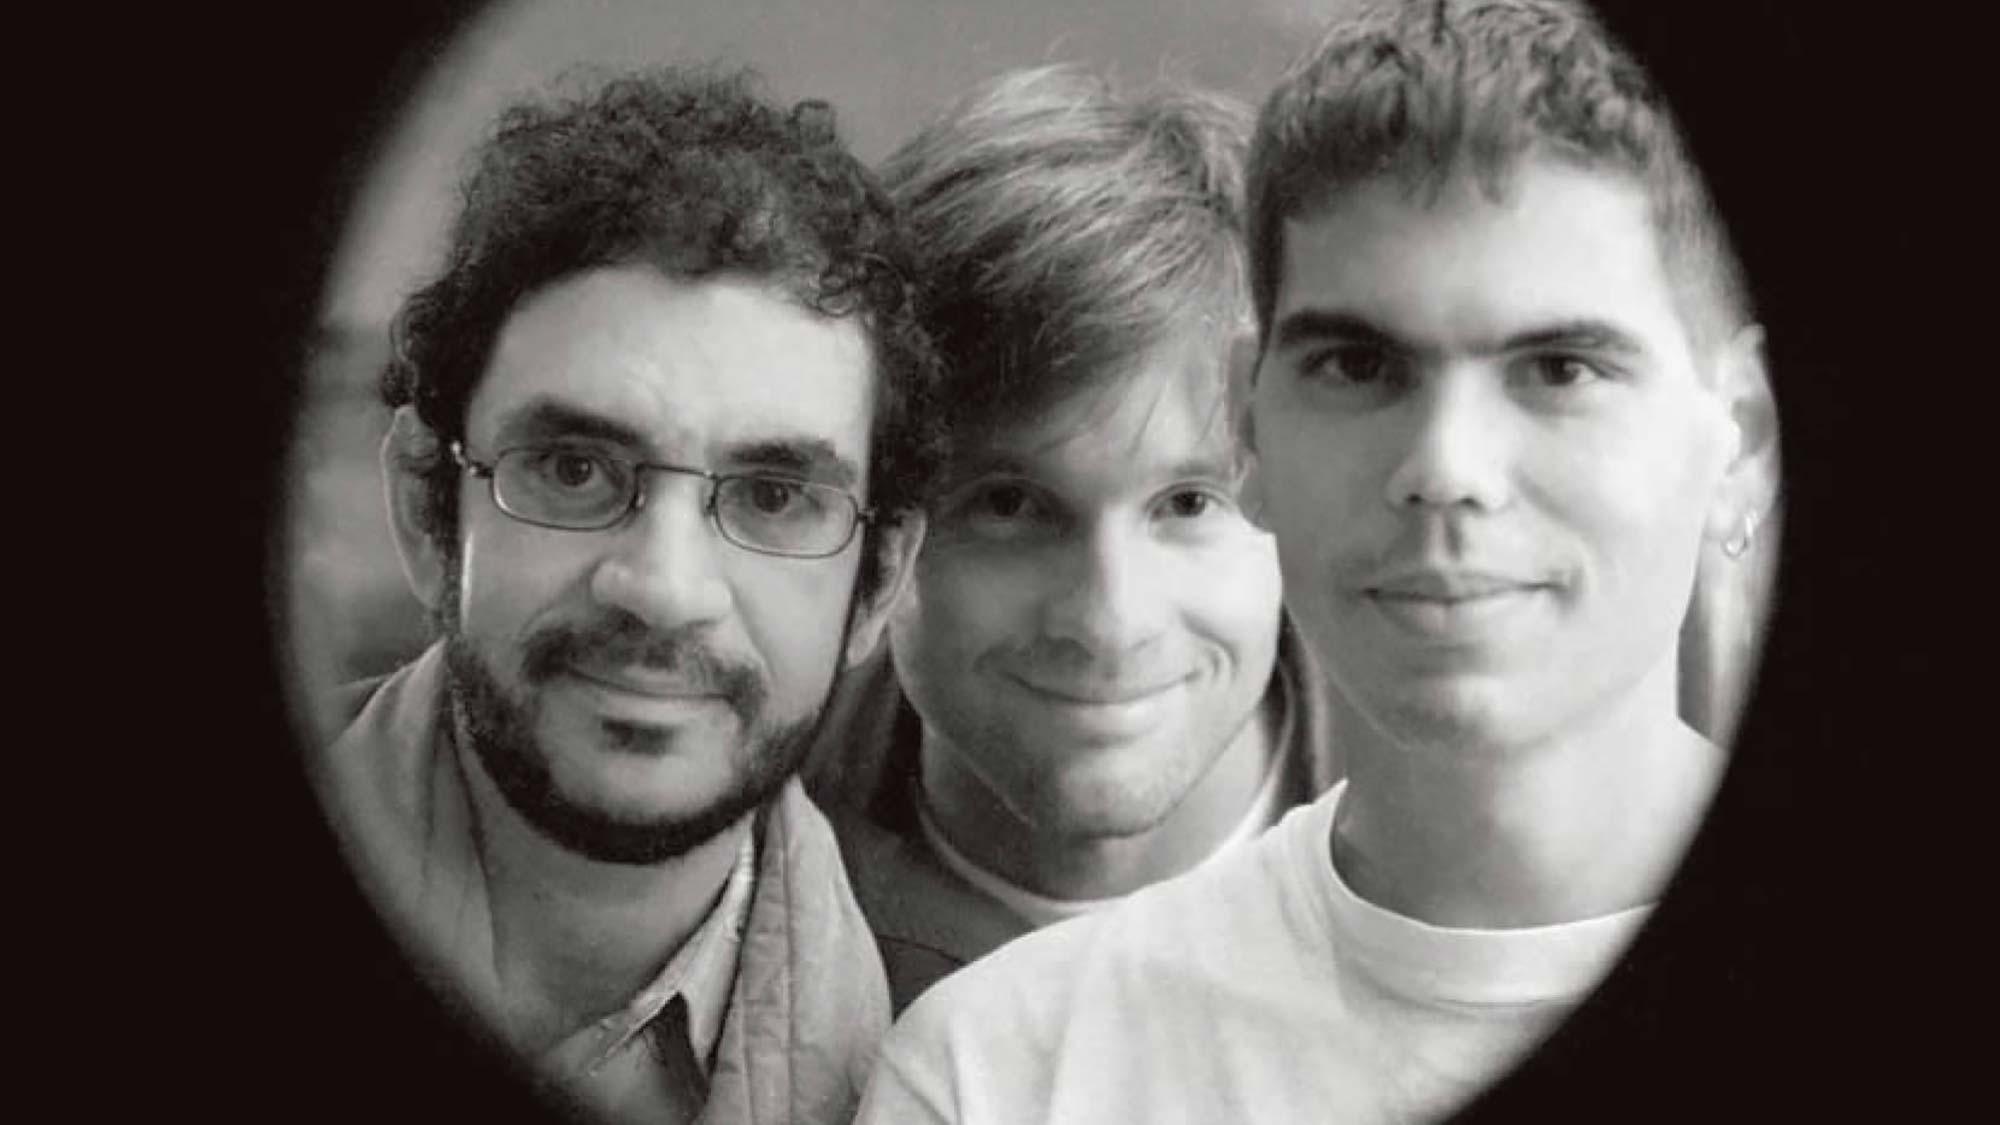 The Legendary Brazilian Band You Need to Know | Anglophenia | BBC ...: www.bbcamerica.com/anglophenia/2016/08/the-legendary-brazilian-band...